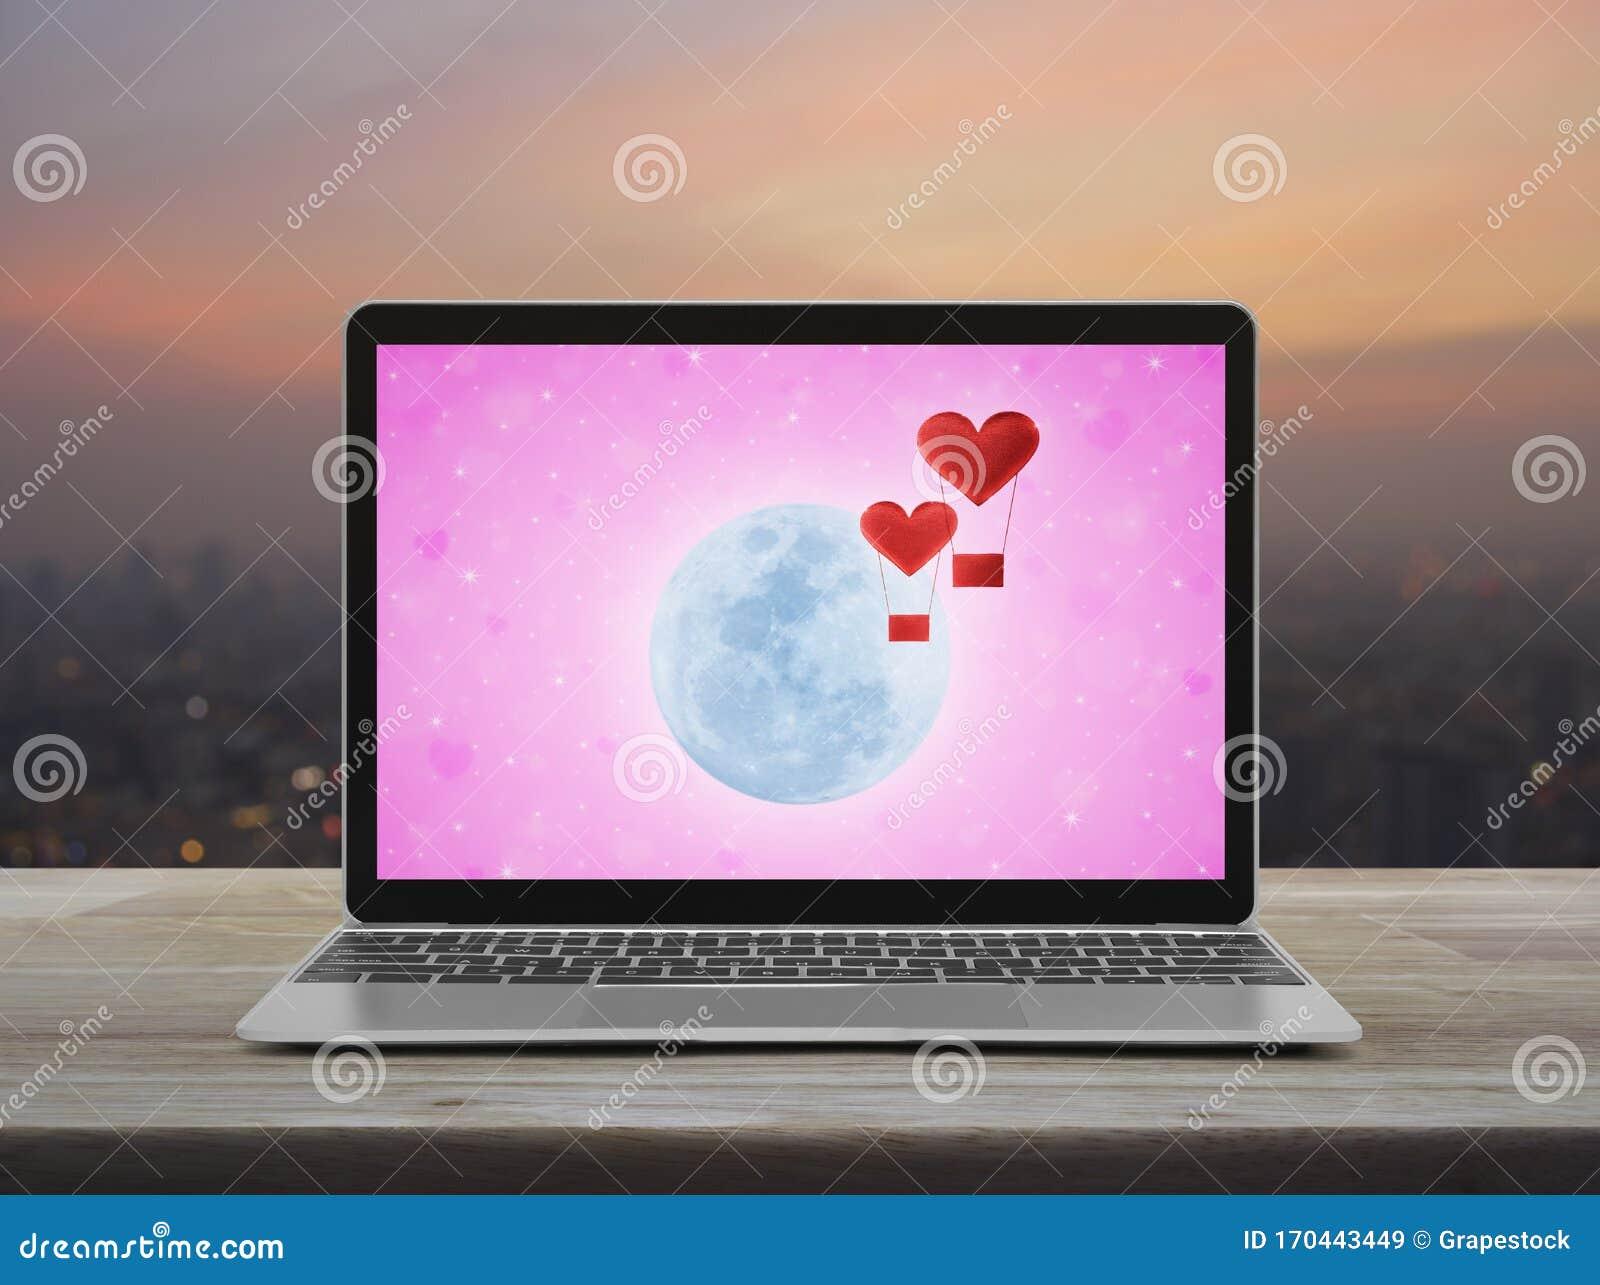 pof website dating